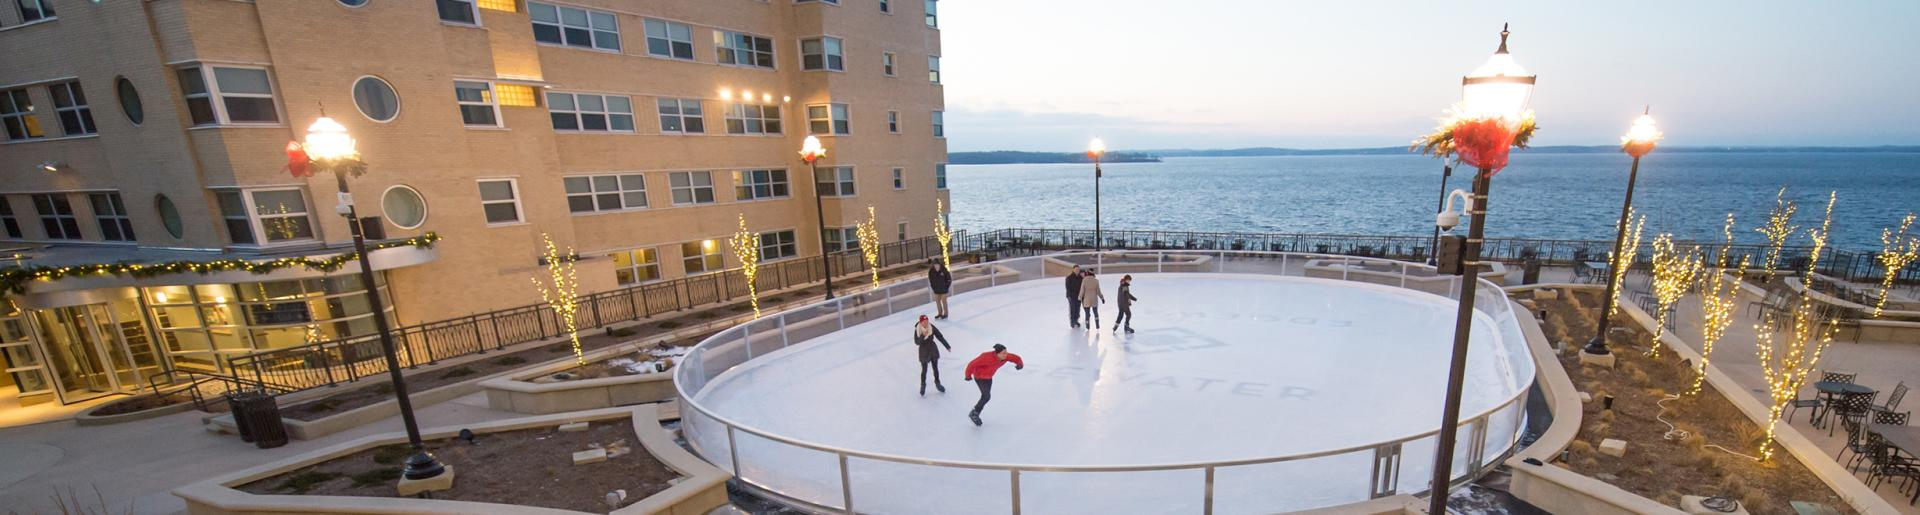 Edgewater Ice Skating Rink